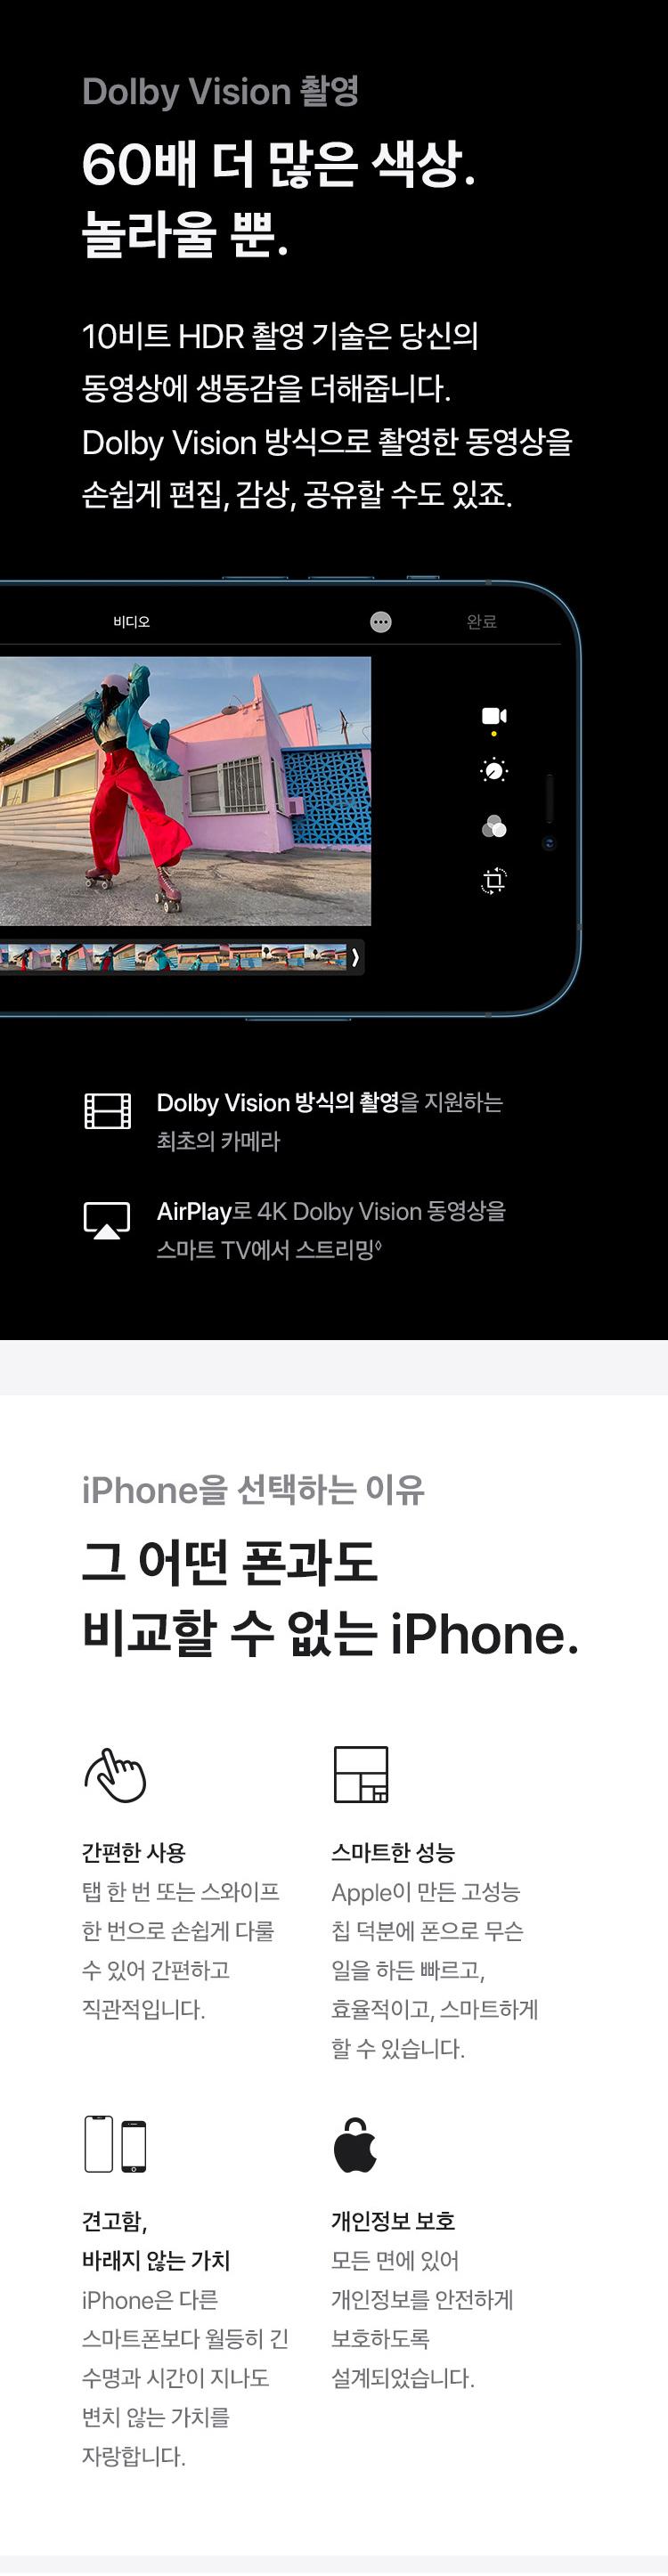 iPhone12-Pro_제품페이지_750px-4.jpg